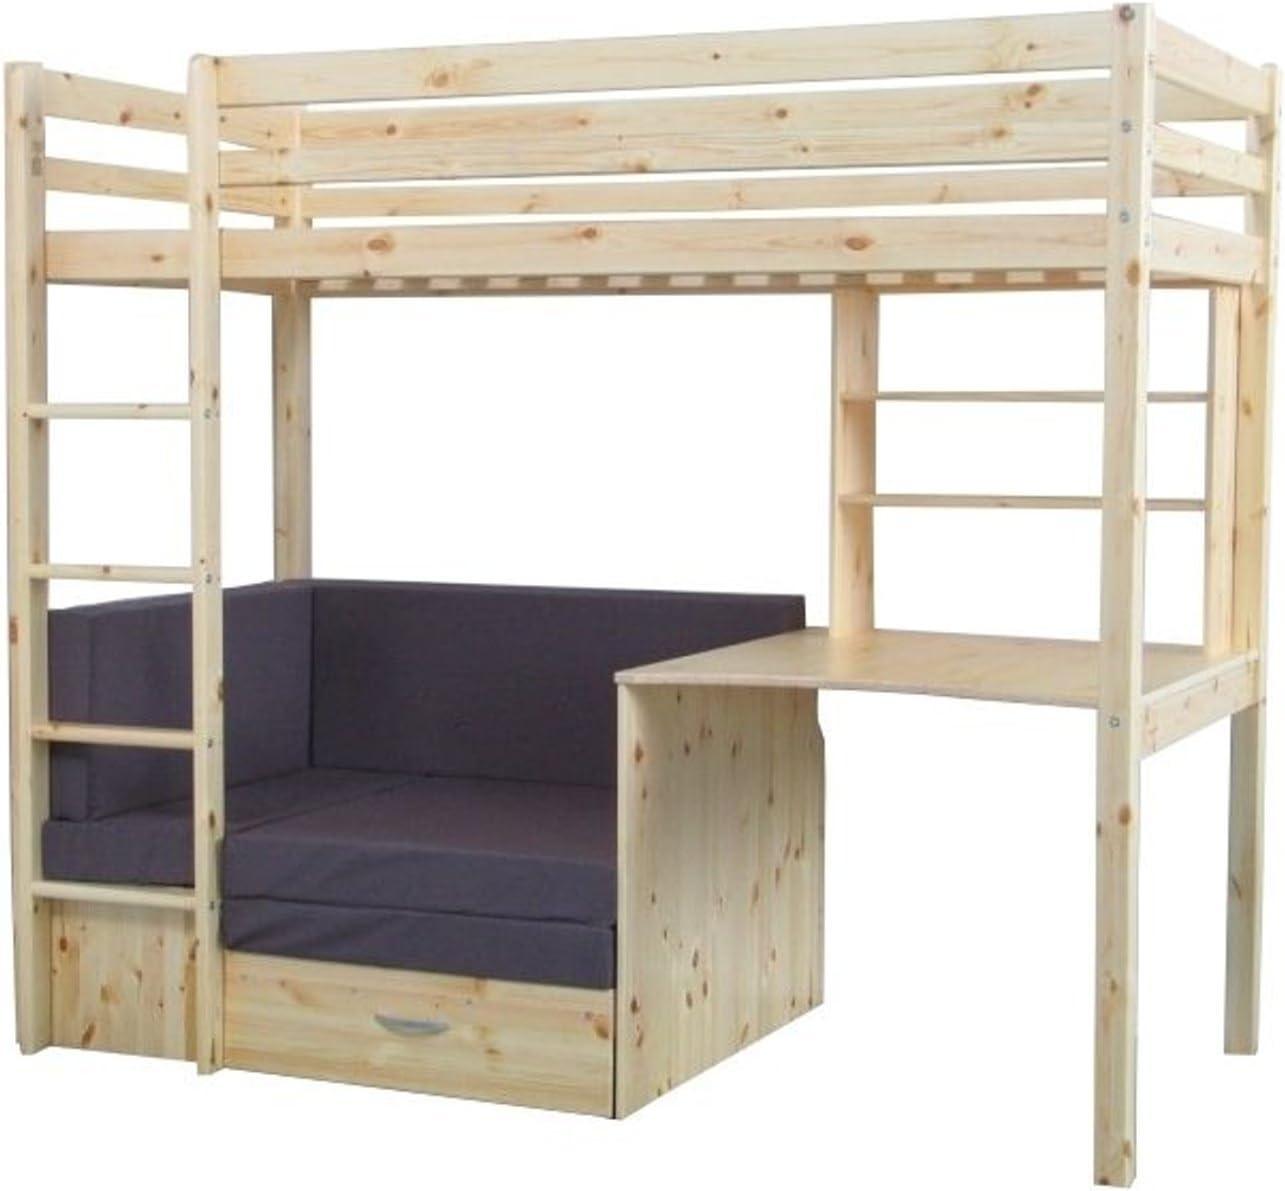 Thuka Bunk Bed 90 X 200 Cm Natural Including Mattress Grey And Sprung Slatted Base Amazon De Kuche Haushalt